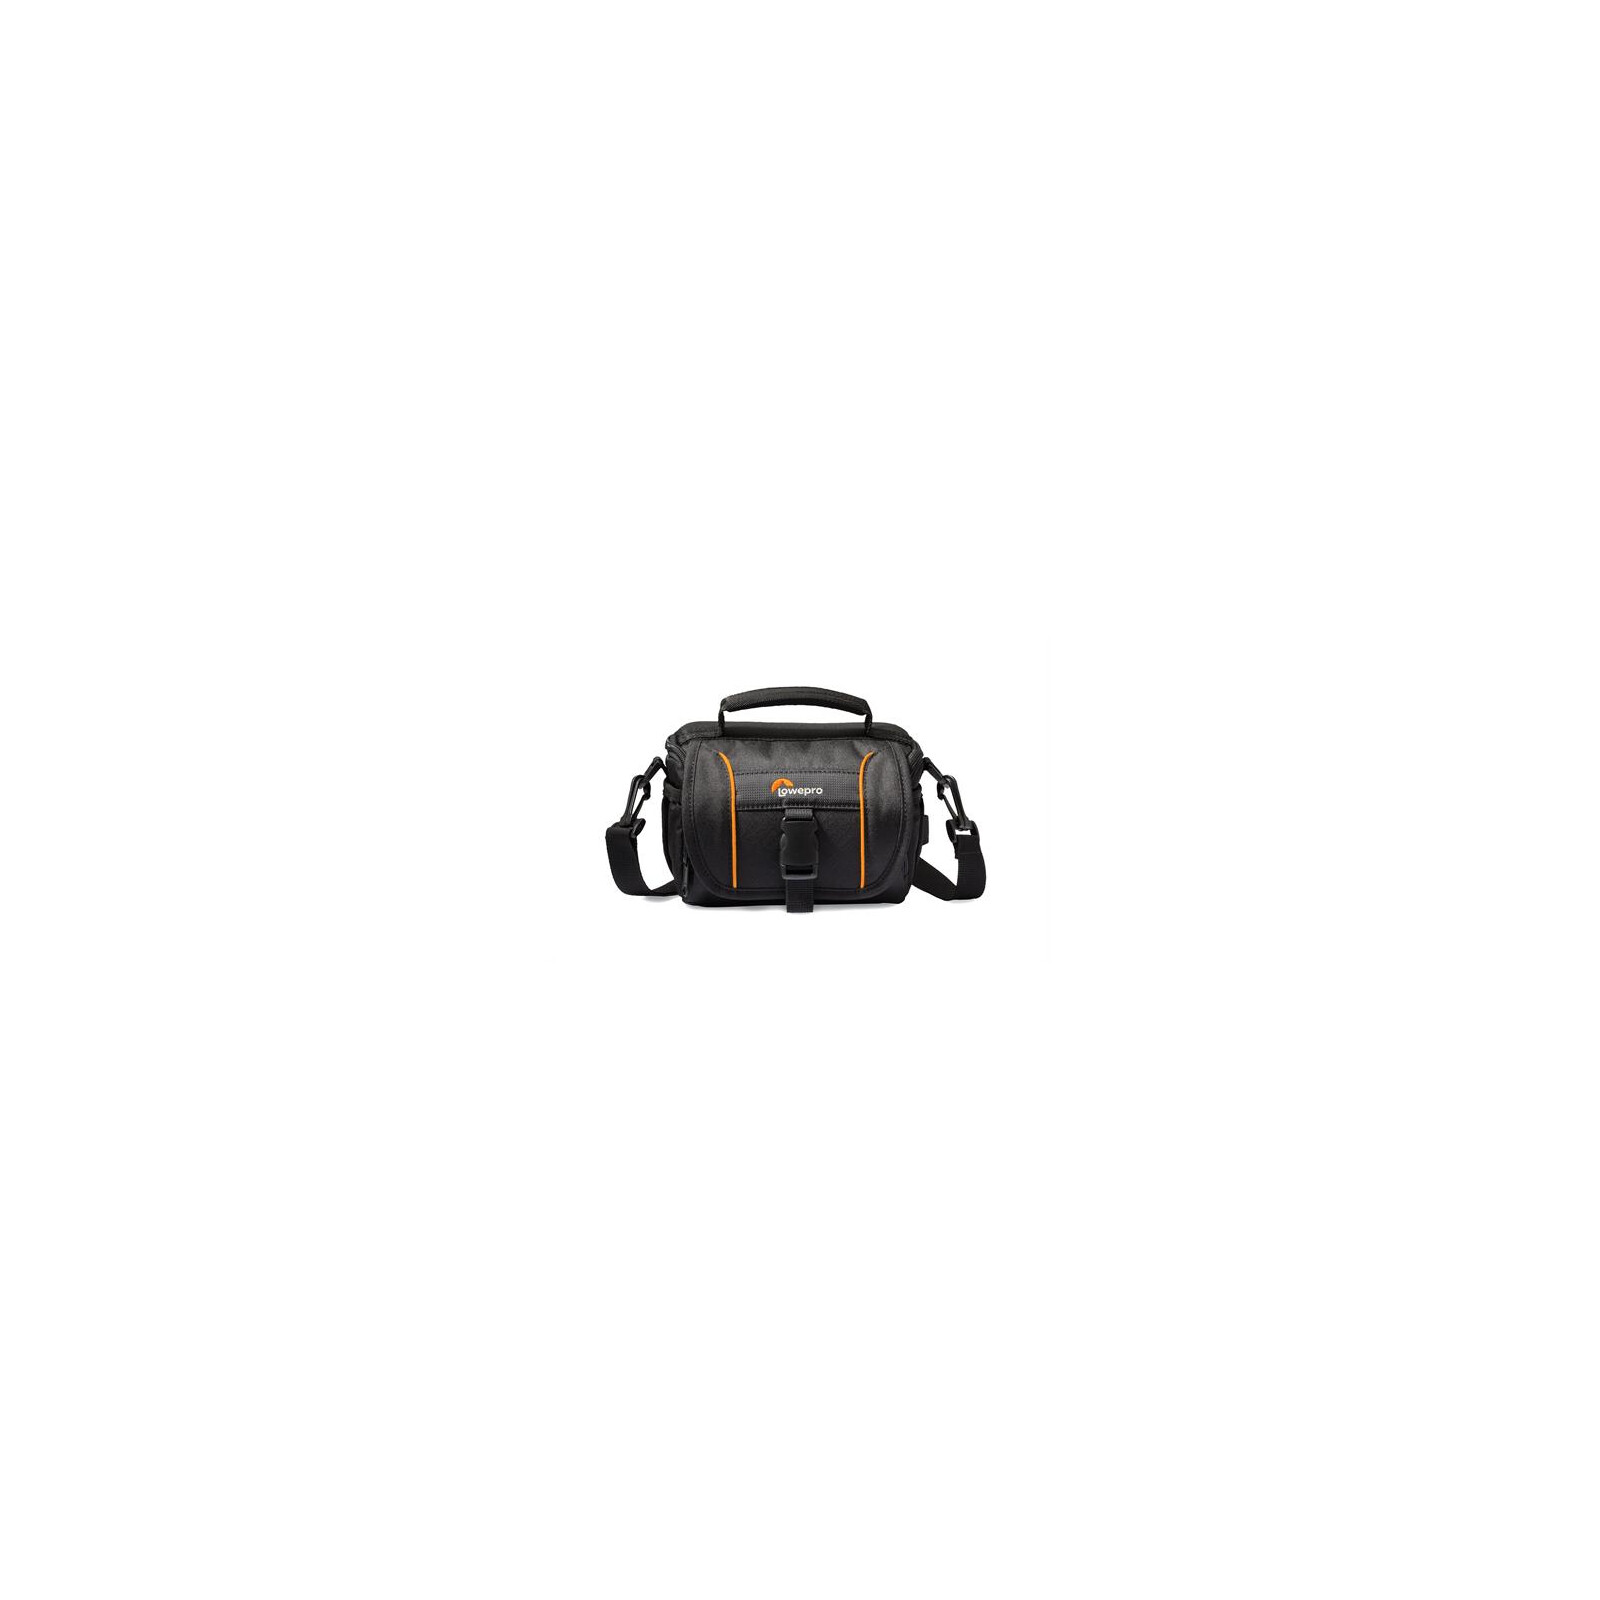 Lowepro Adventura II 110 schwarz